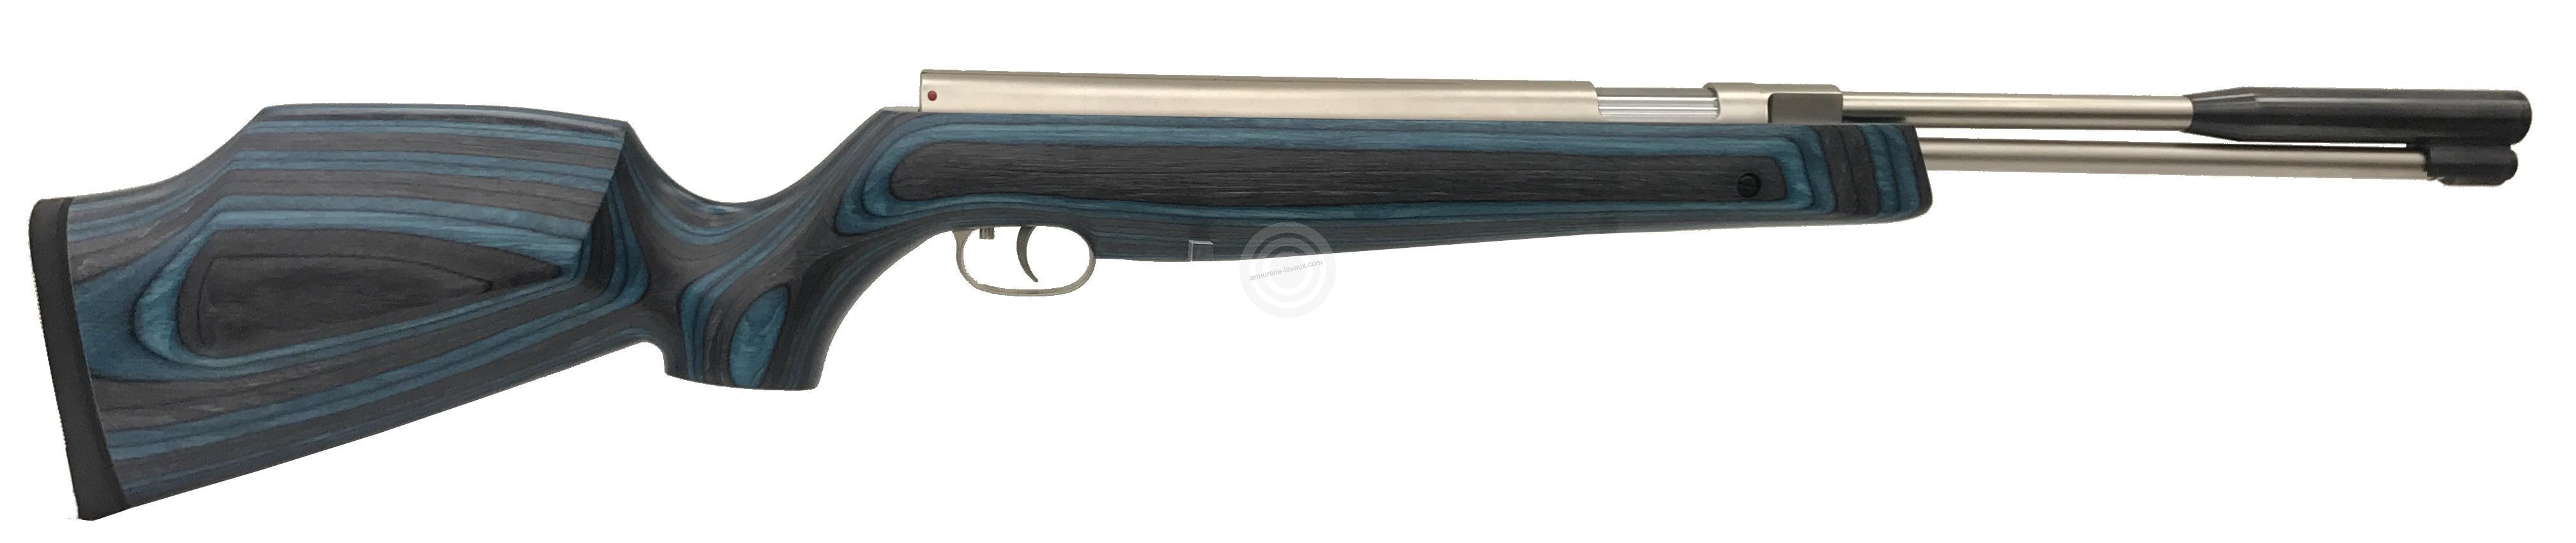 Carabine à air comprimé WEIHRAUCH HW 97K Stainless Lamellé